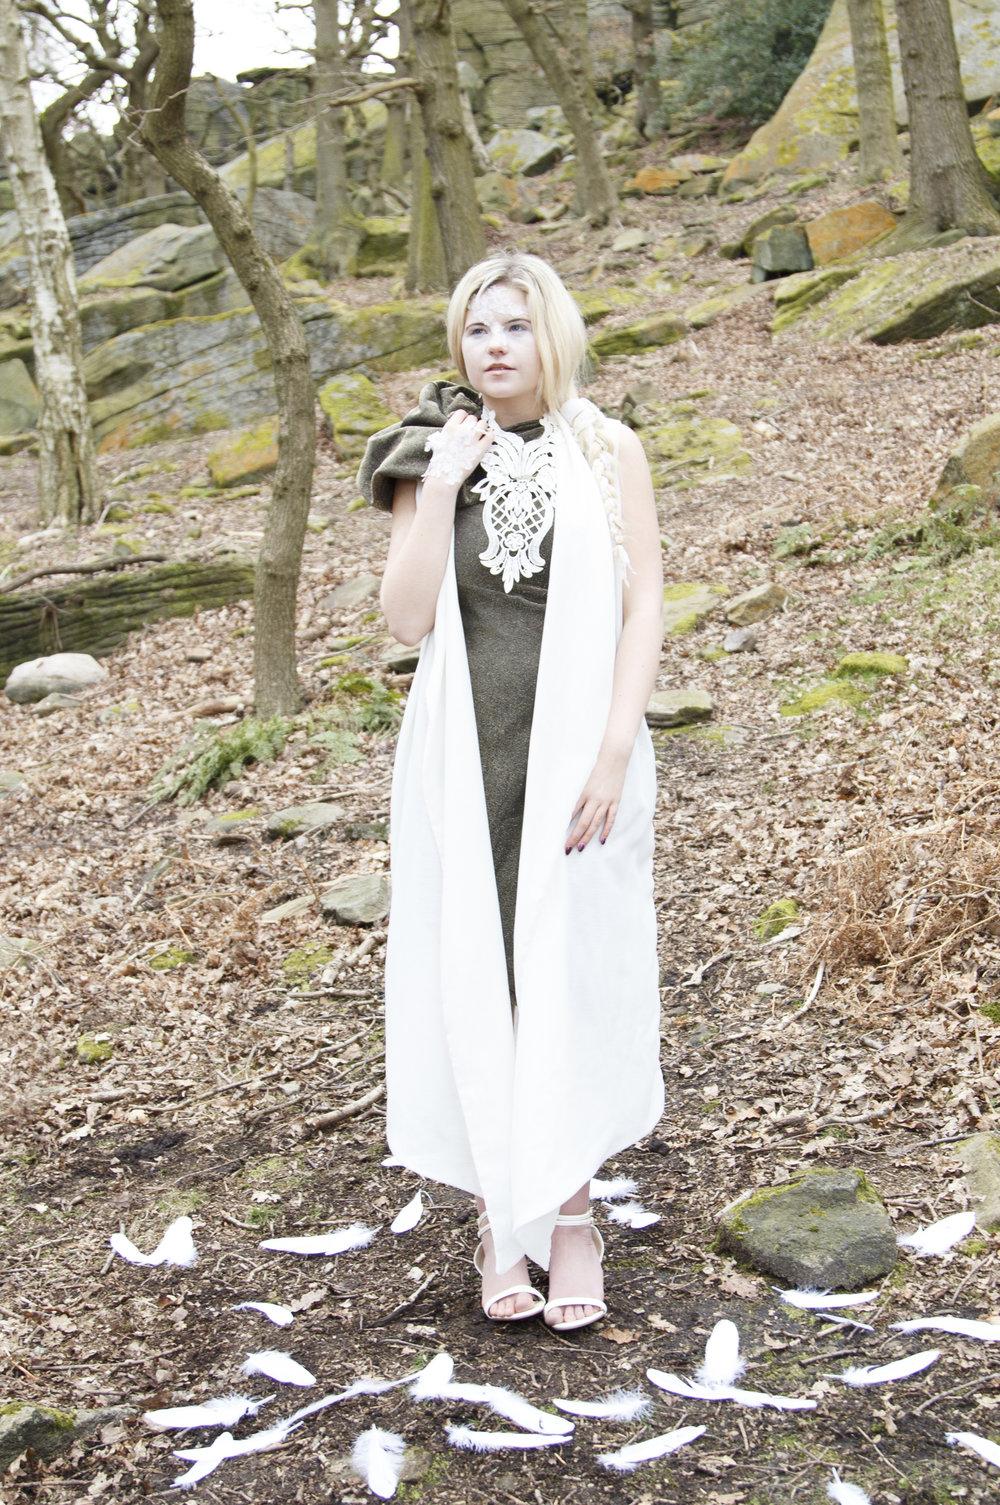 zaramia-ava-zaramiaava-leeds-fashion-designer-ethical-sustainable-smoke-versatile-drape-wrap-gold-cowl-white-dress-styling-location-womenswear-models-photoshoot-location-lace-2